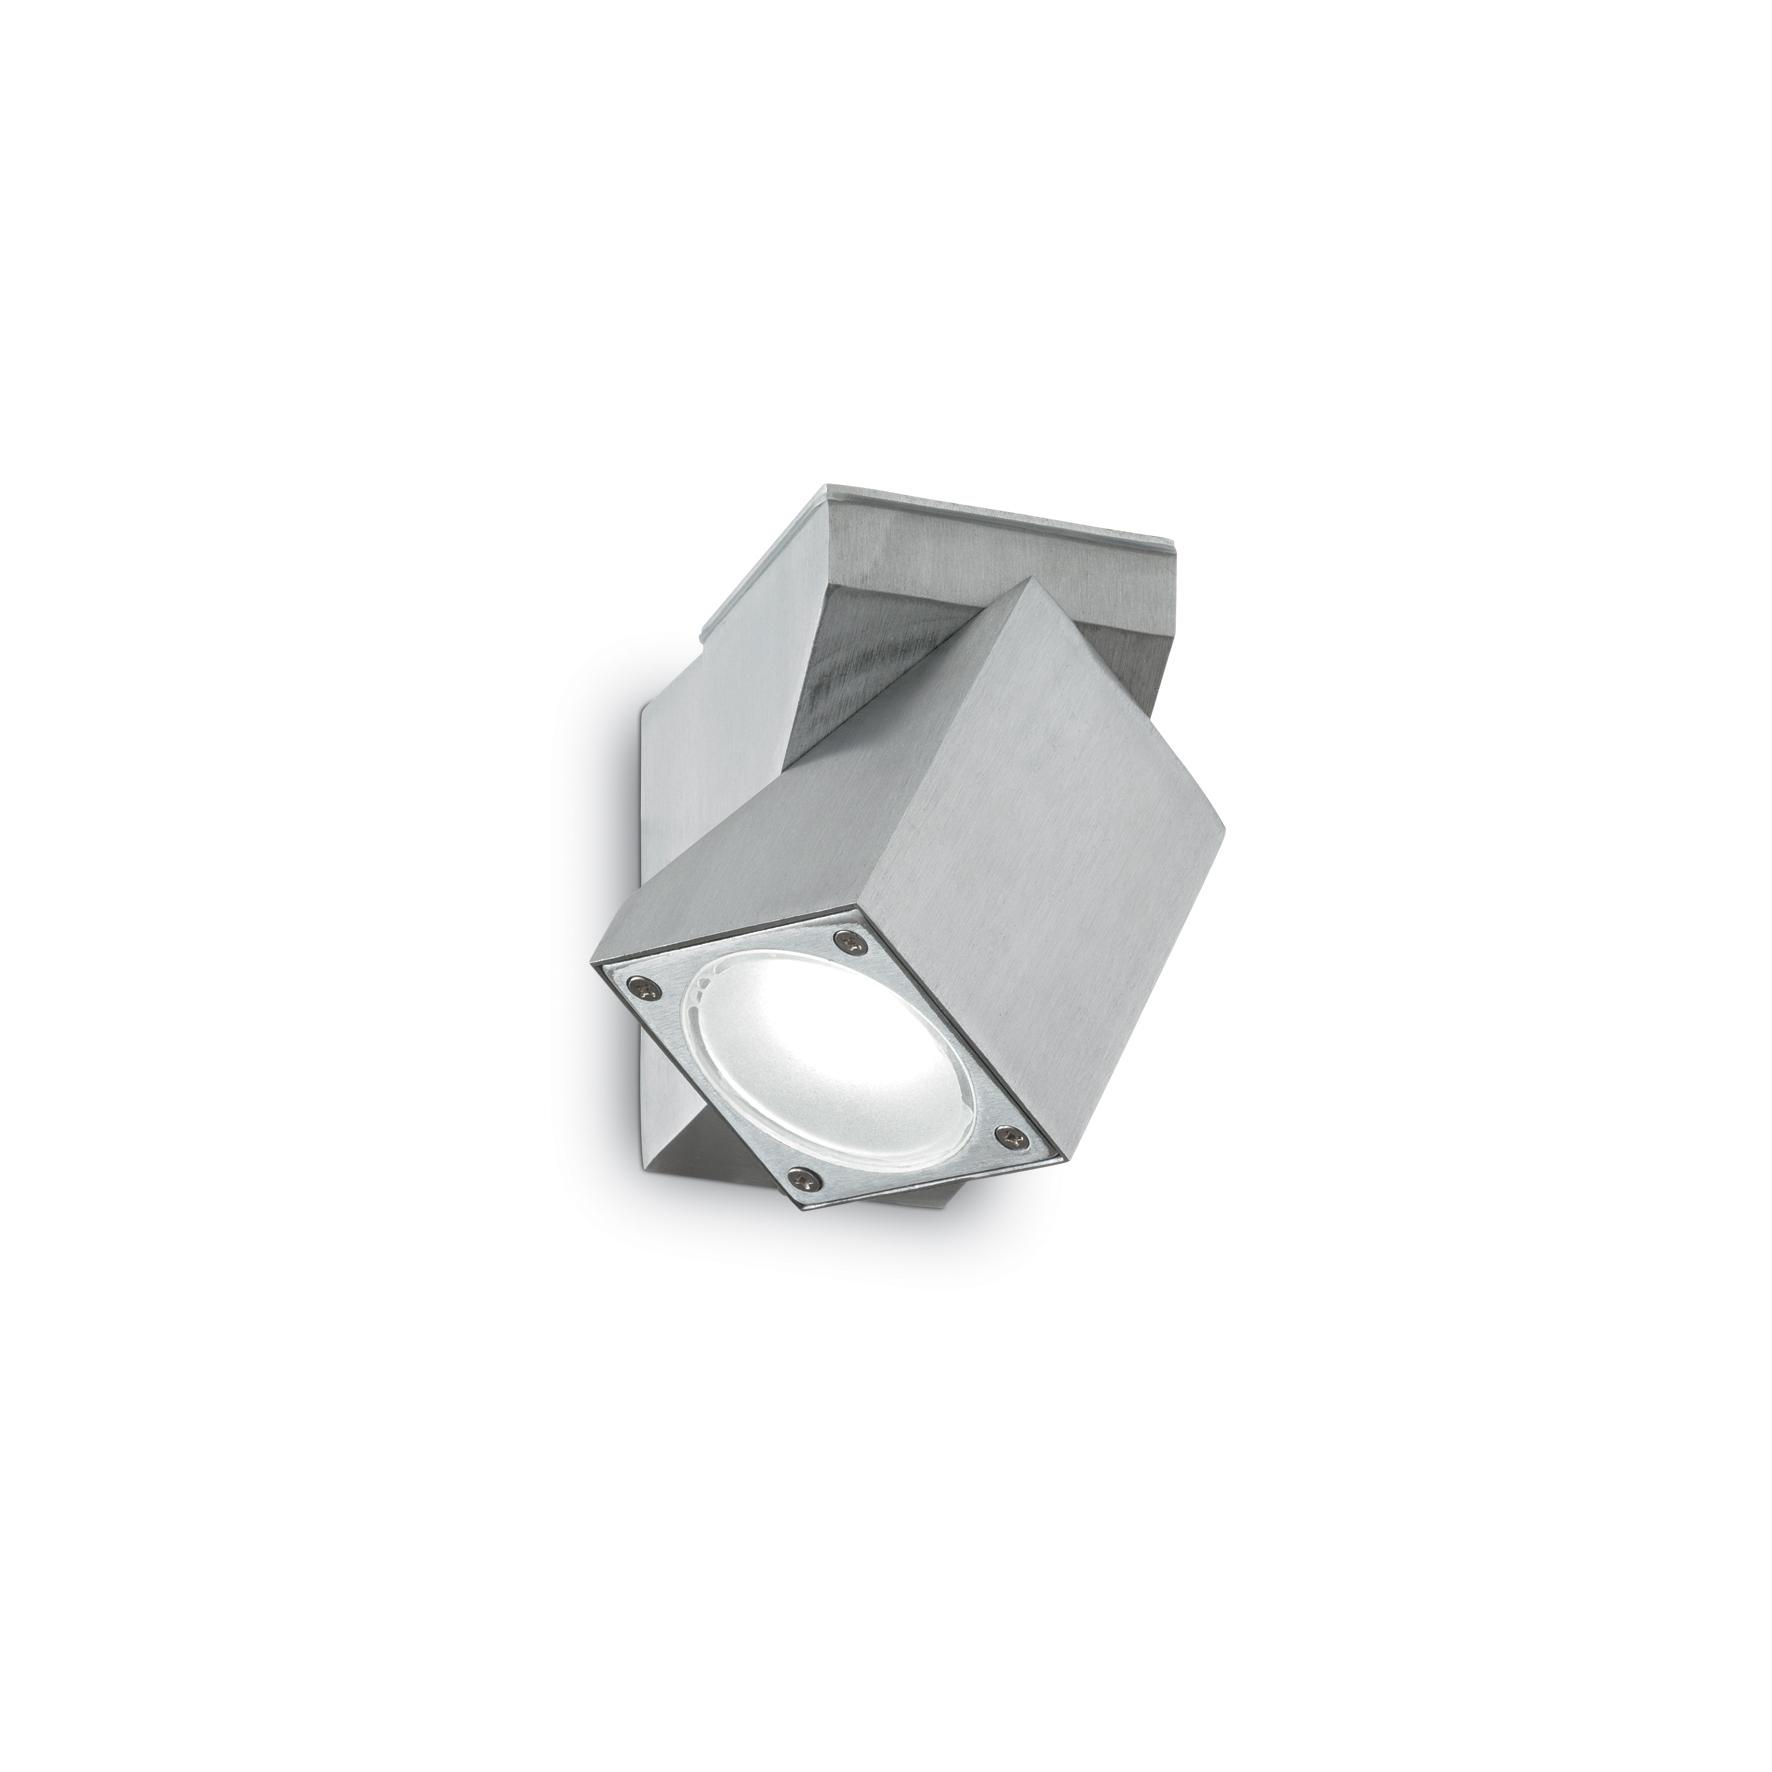 Aplica Zeus AP1 Aluminiu imagine